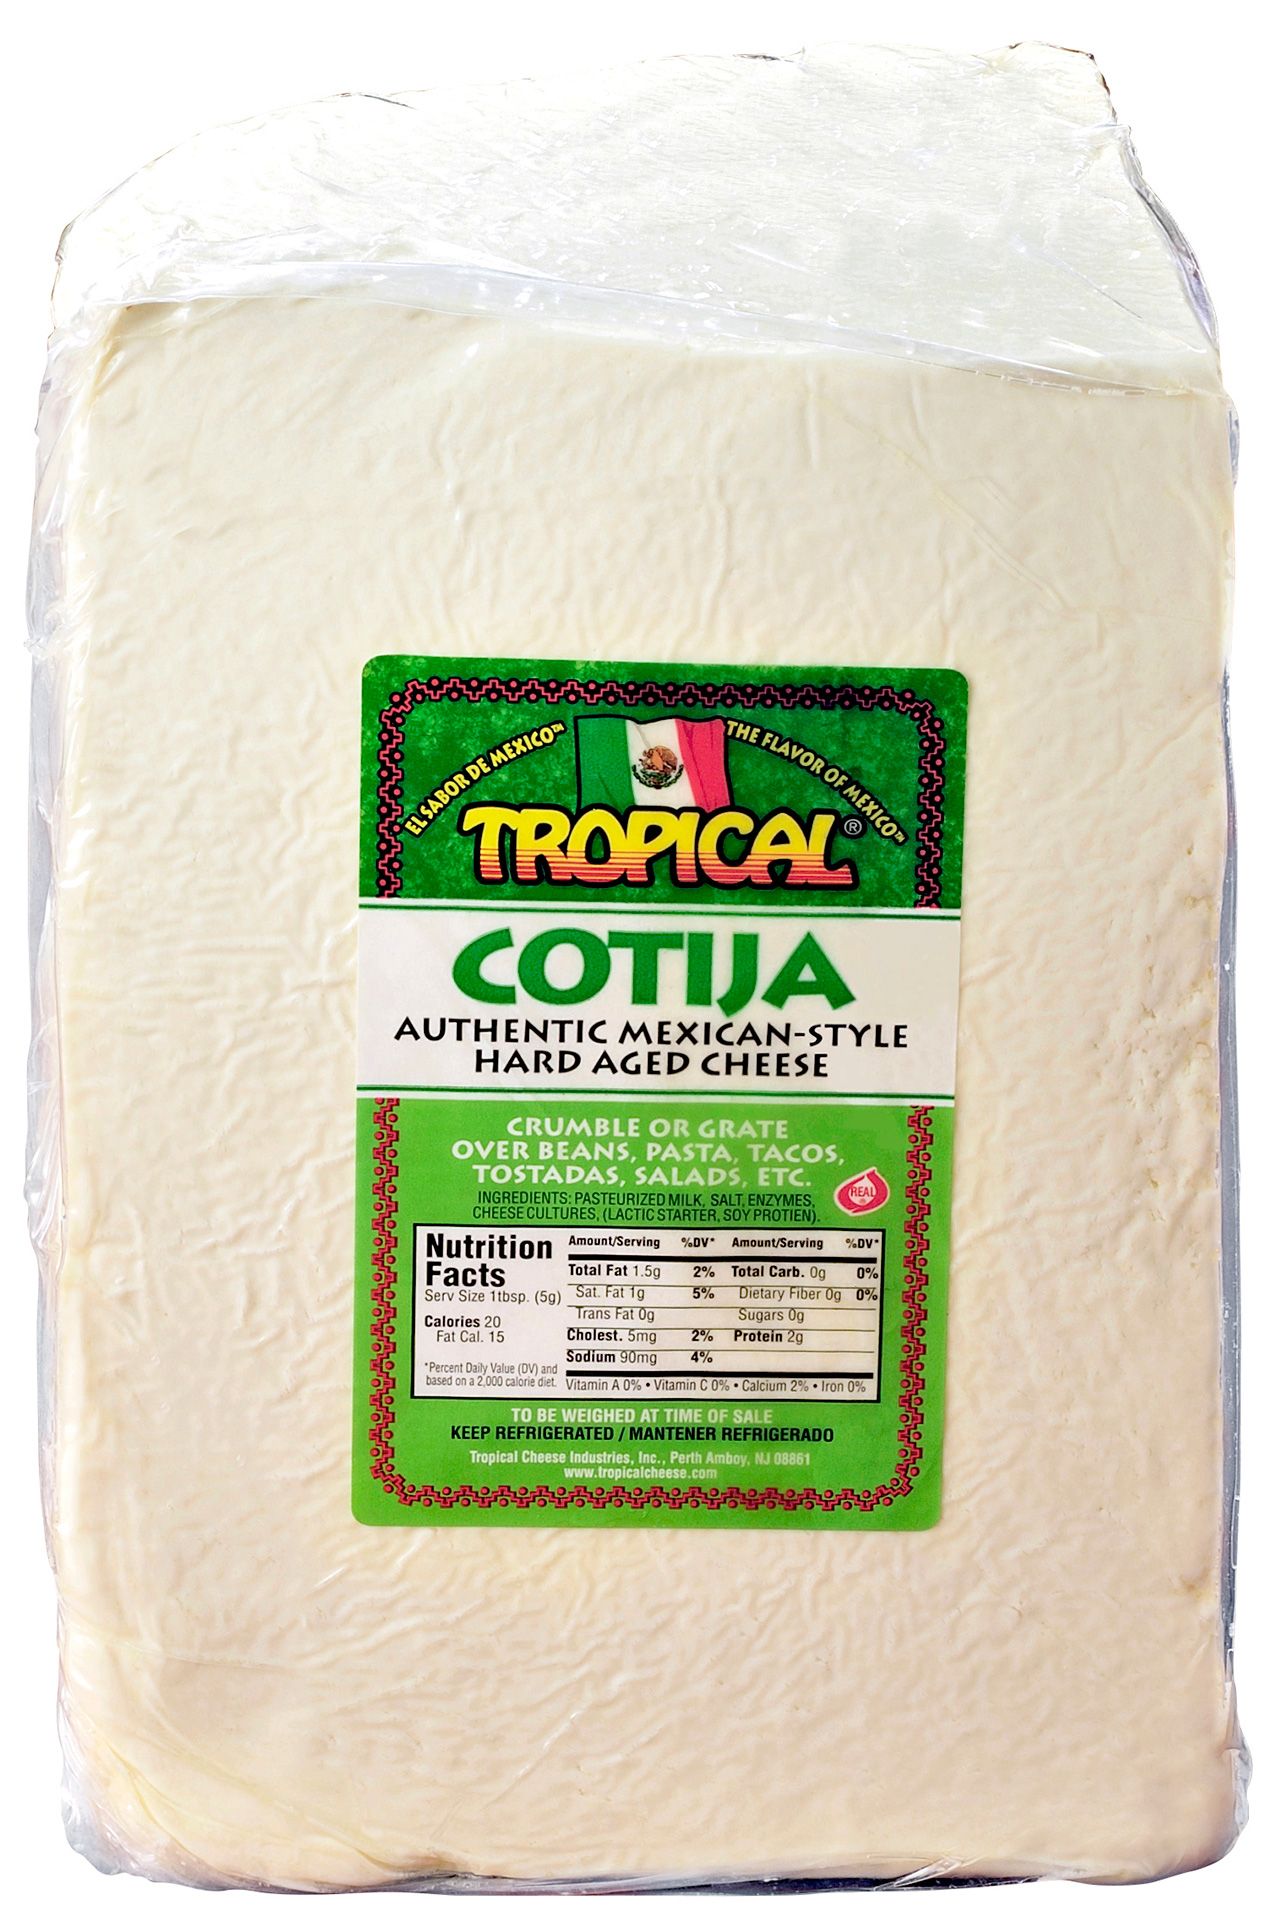 Cotija 1 4 Wheel Tropical Cheese